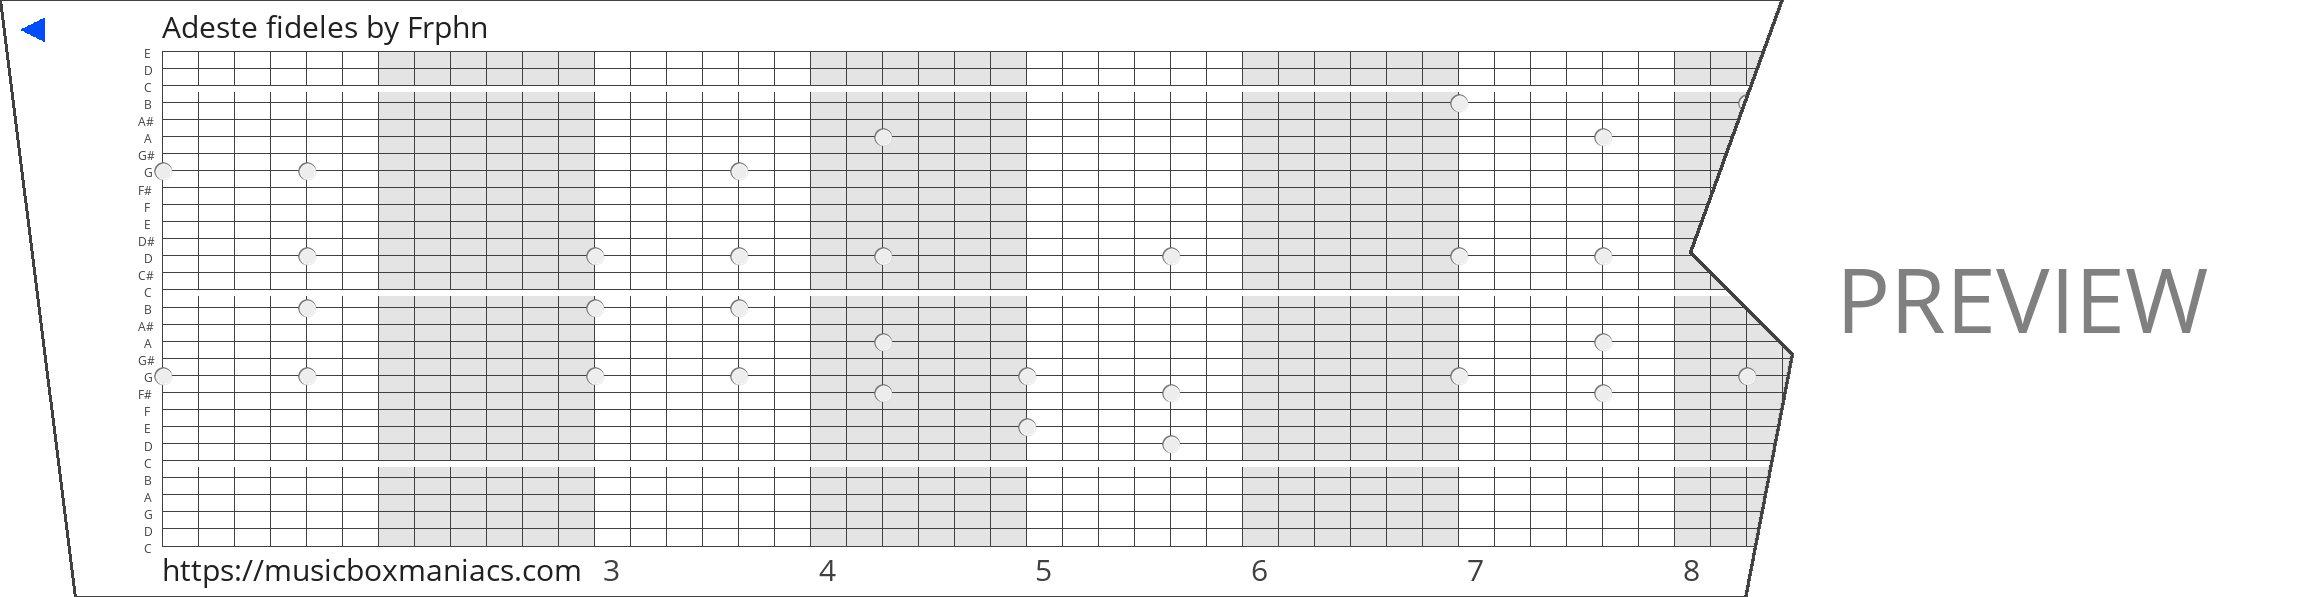 Adeste fideles 30 note music box paper strip